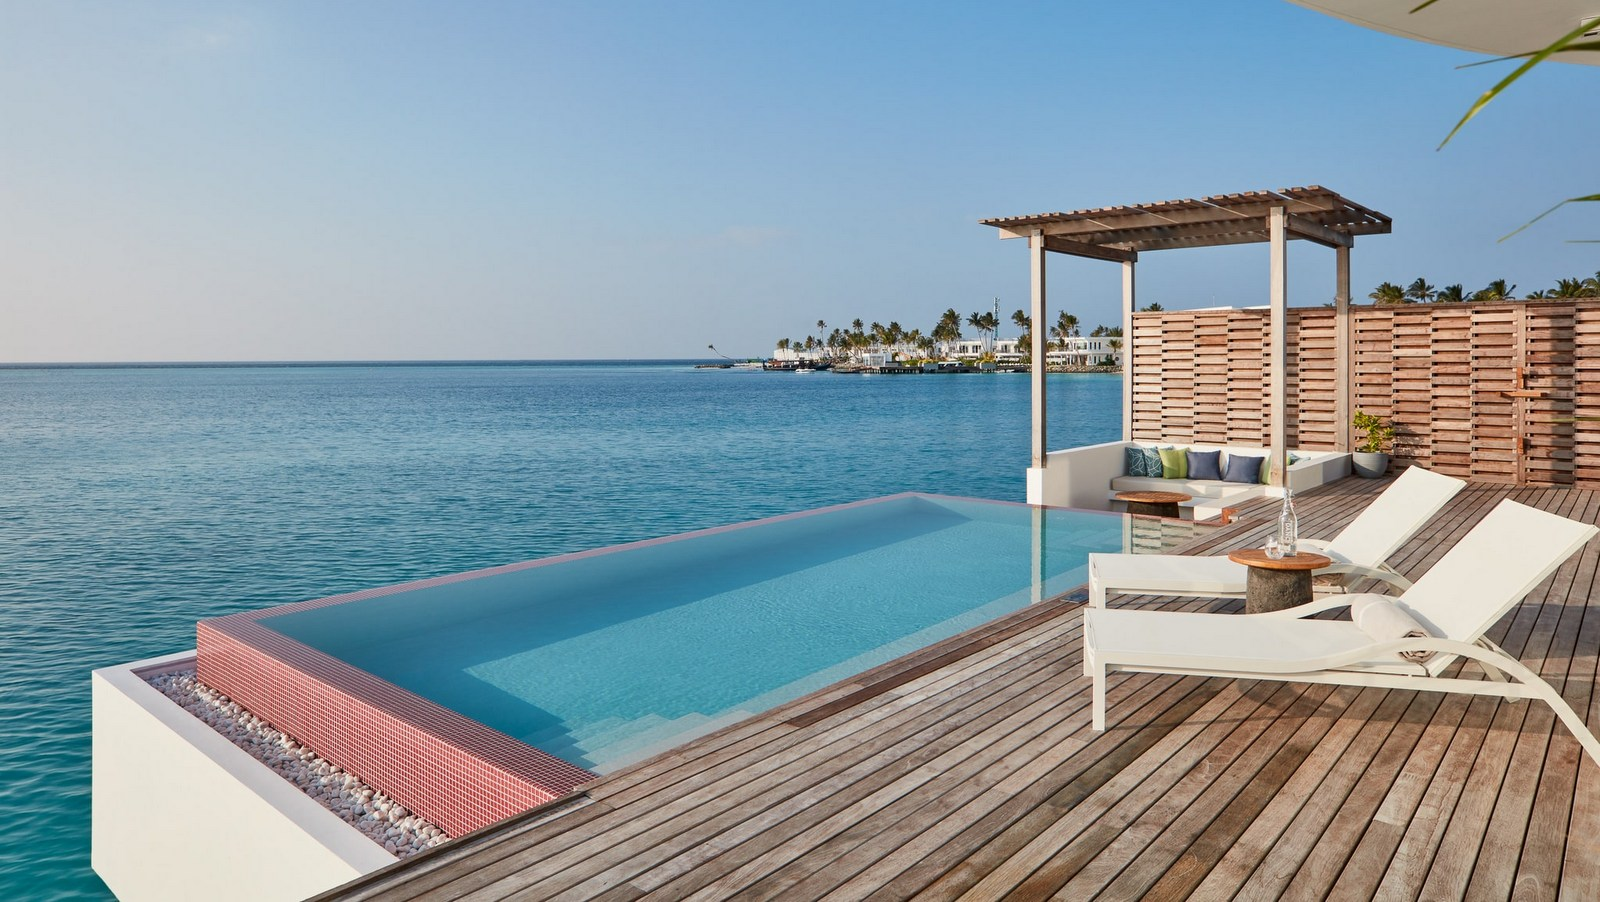 Мальдивы, отель LUX North Male Atoll, номер Water Villa with Pool